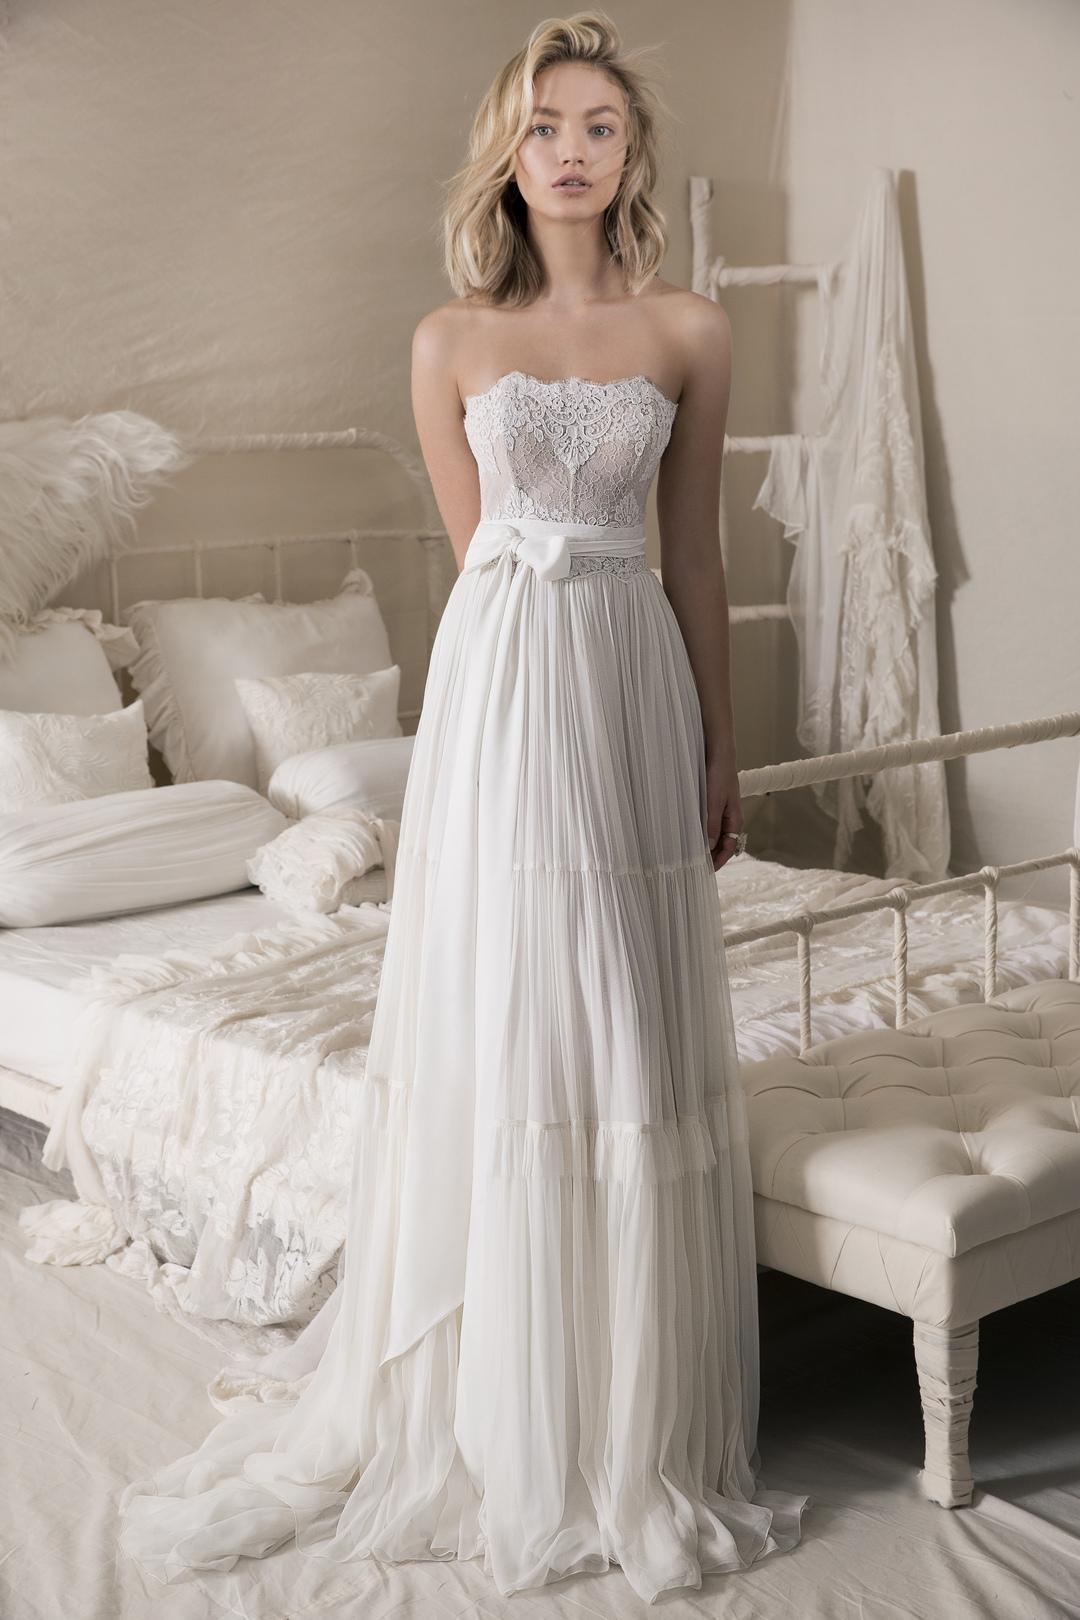 Dress main 2x 1544550954